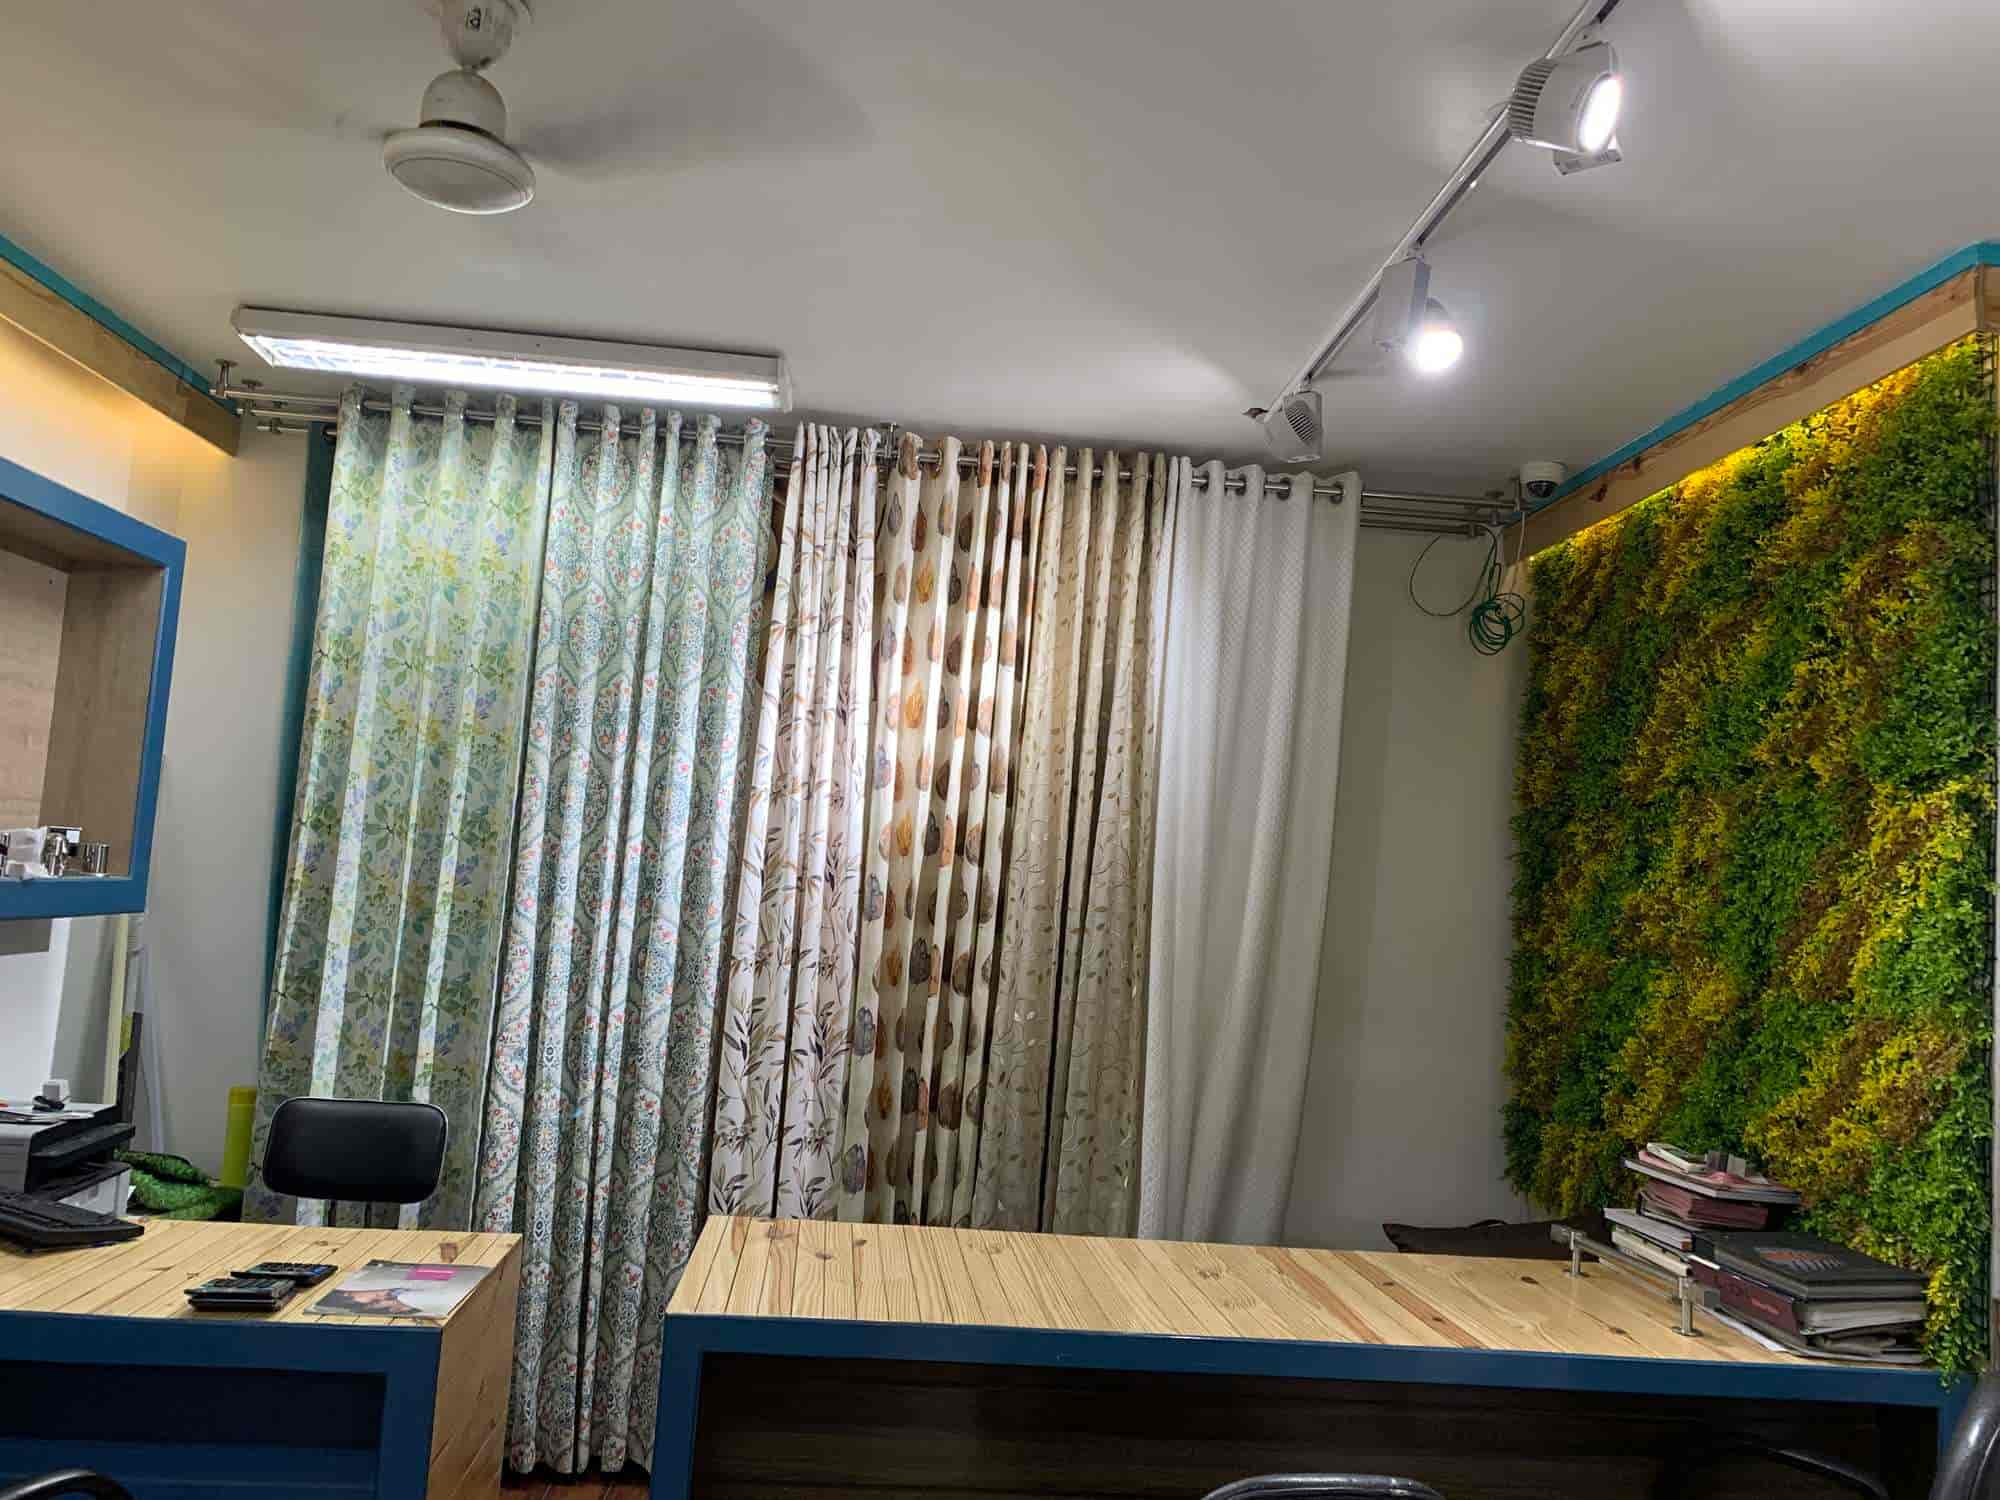 Dream Home Decor And Dhd Bath Concepts Mansarovar Double